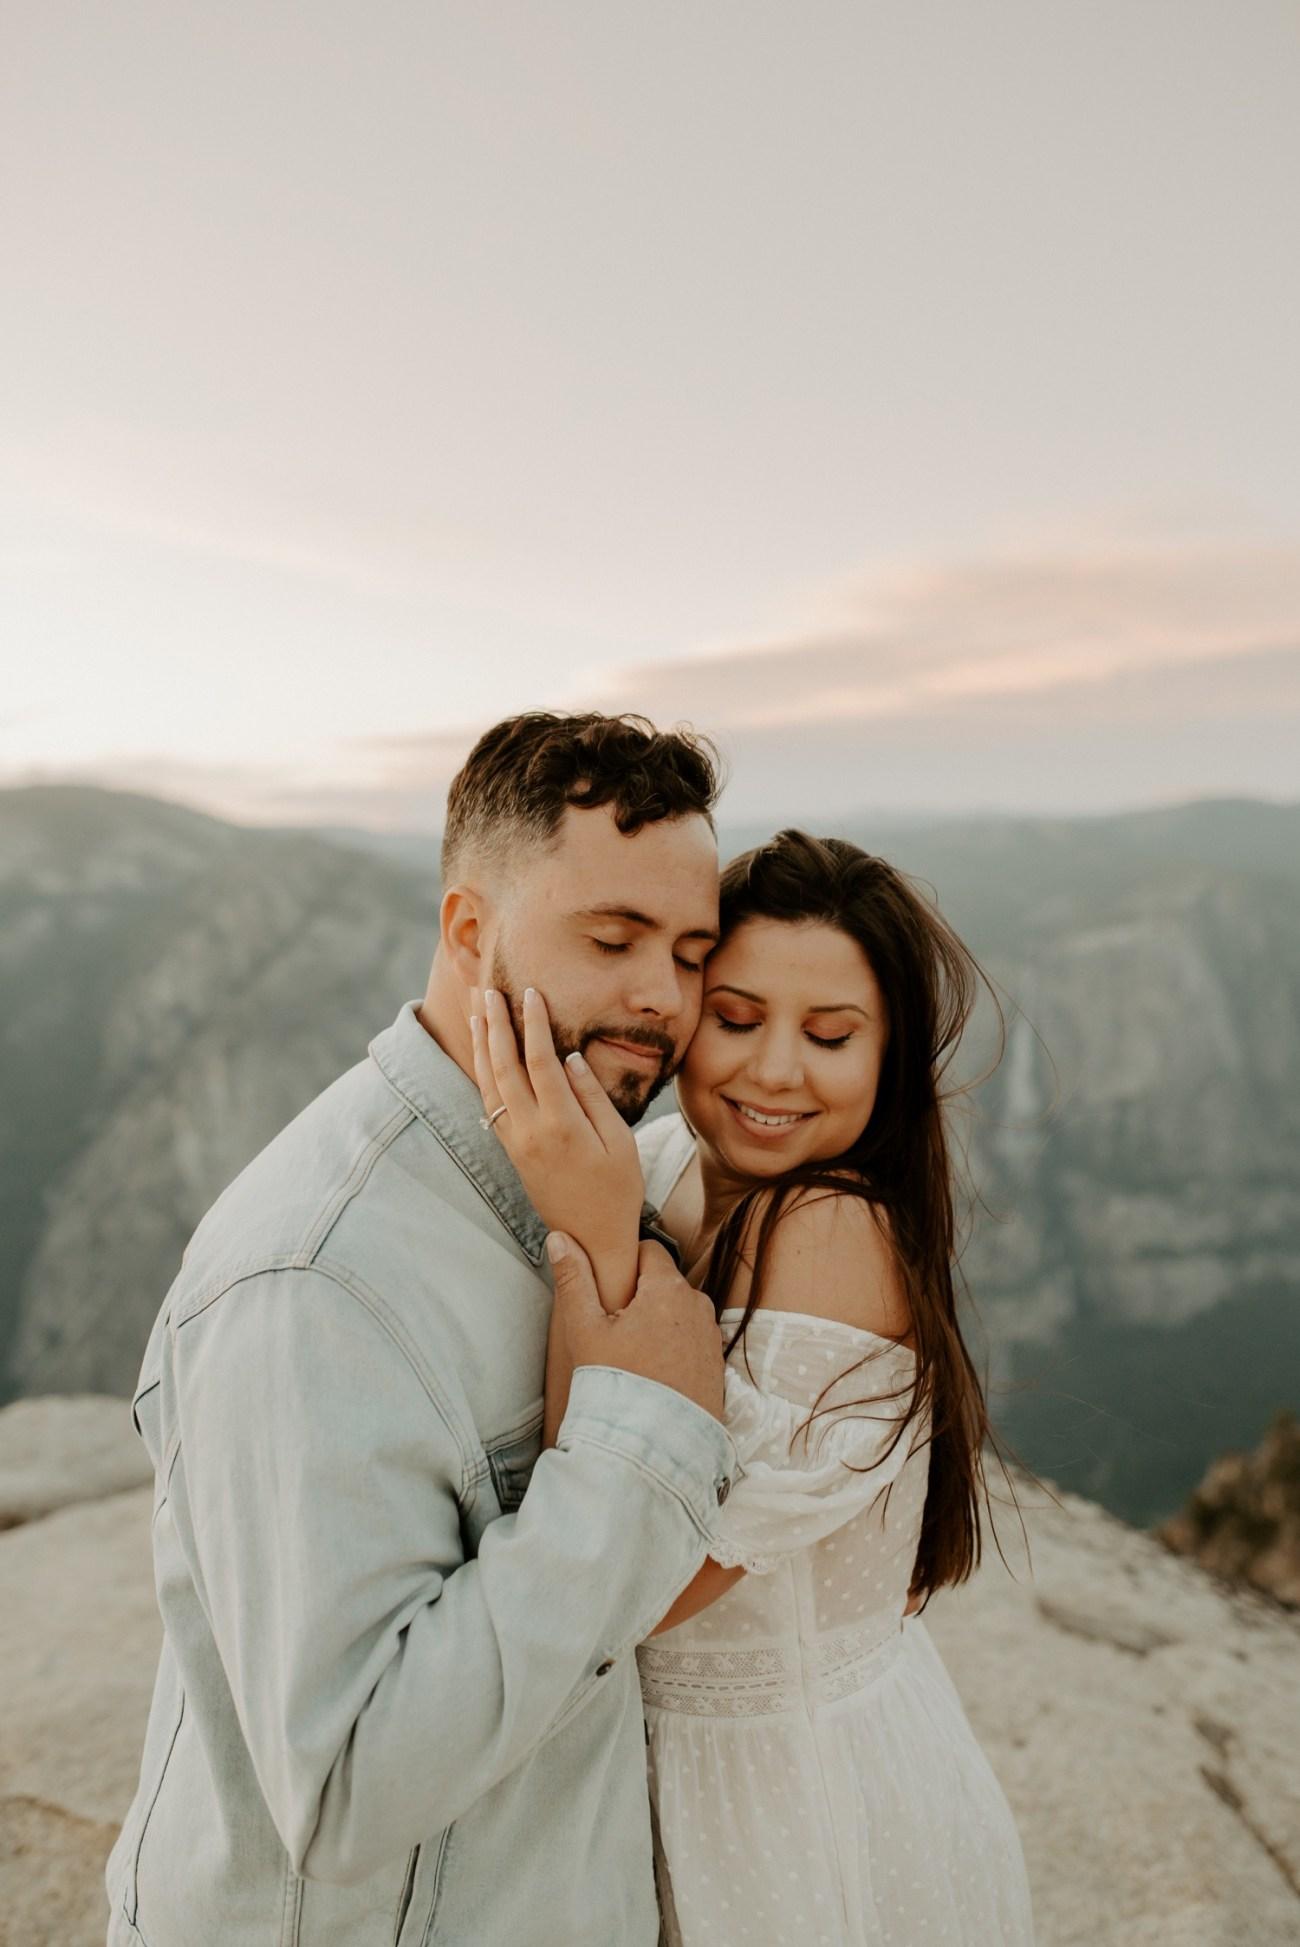 Yosemite Taft Point Engagement Session California Wedding Photographer Anais Possamai Photography 35